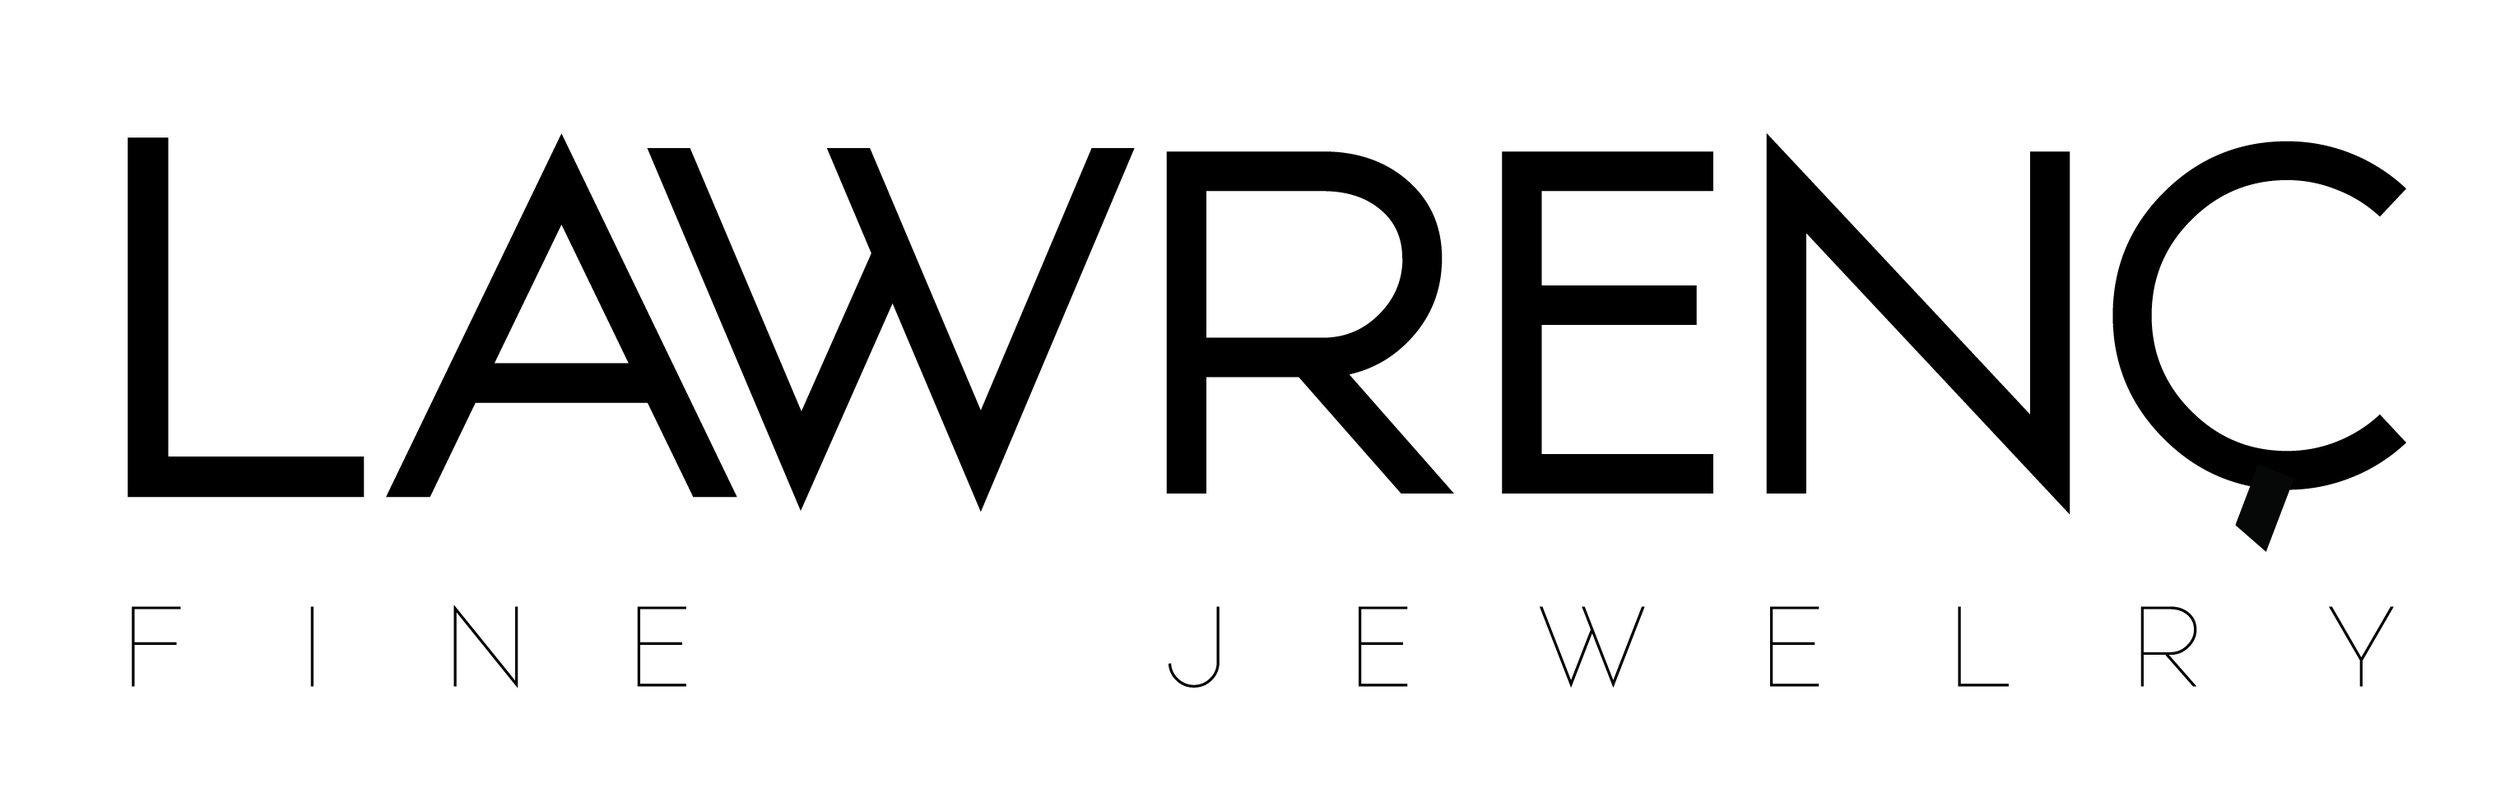 Lawrenc jewellery logo